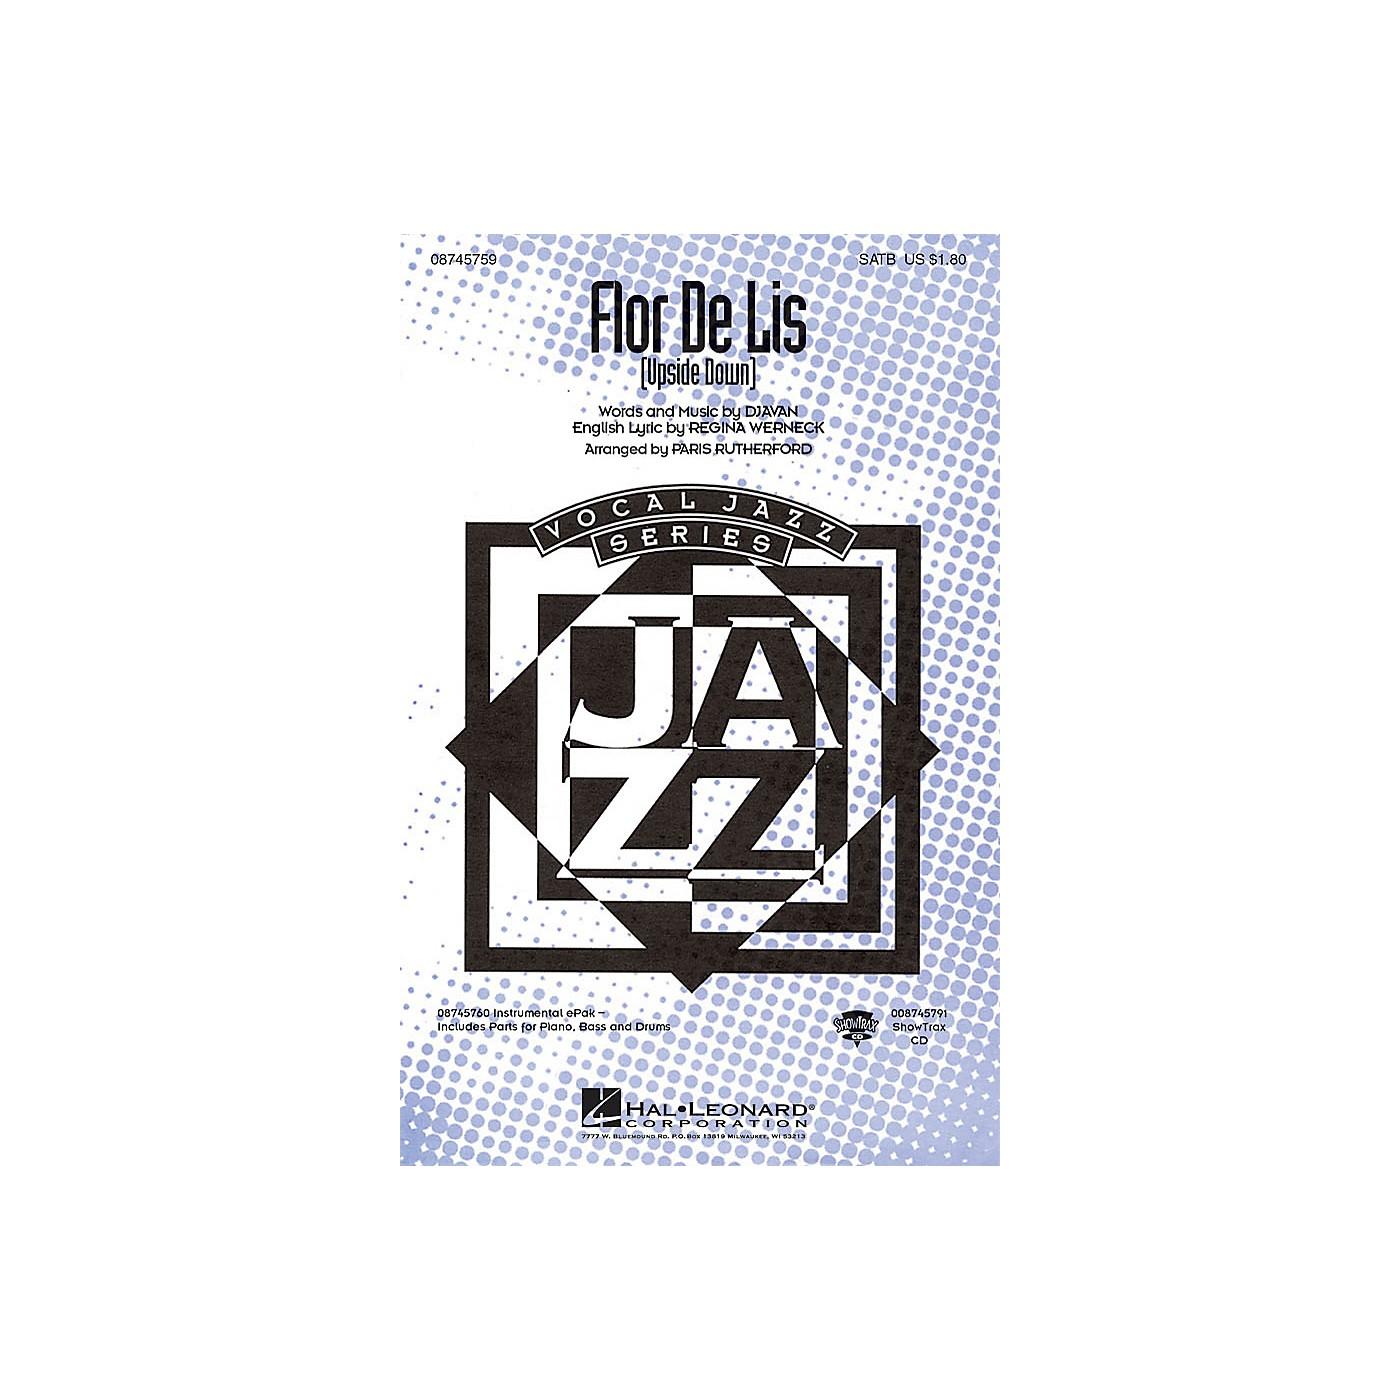 Hal Leonard Flor De Lis (Upside Down) ShowTrax CD Arranged by Paris Rutherford thumbnail